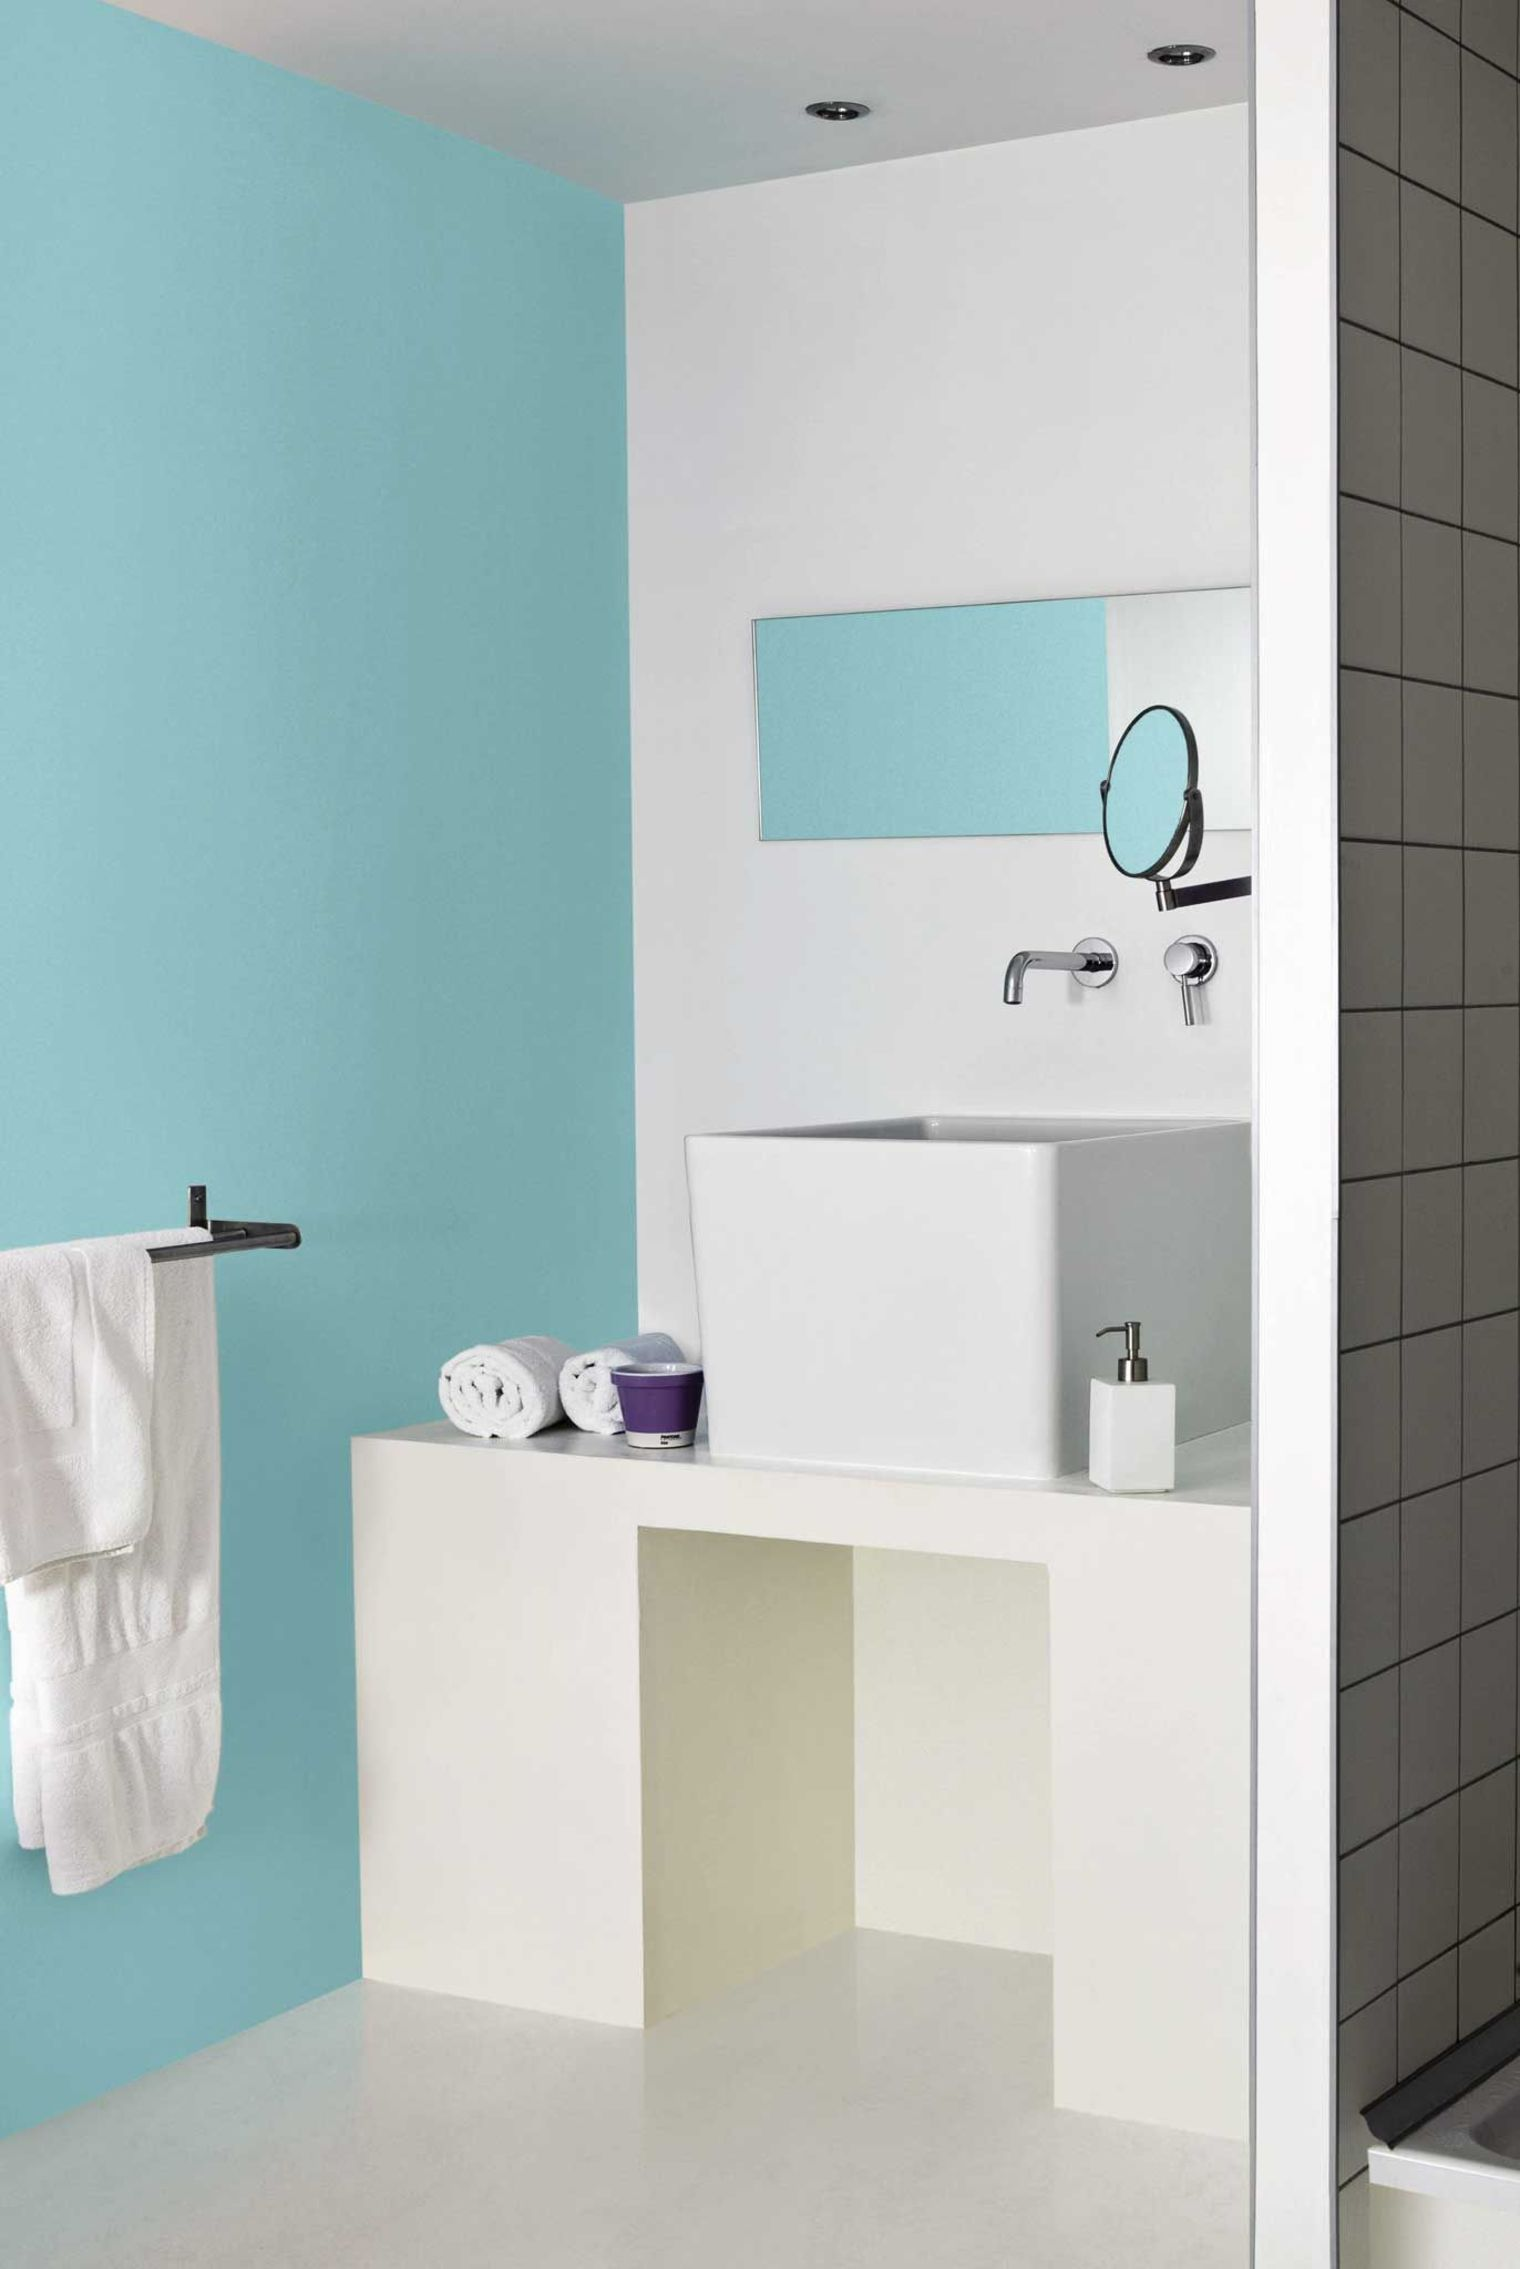 Peinture carrelage salle de bain fashion designs for Carrelage salle de bain brico depot